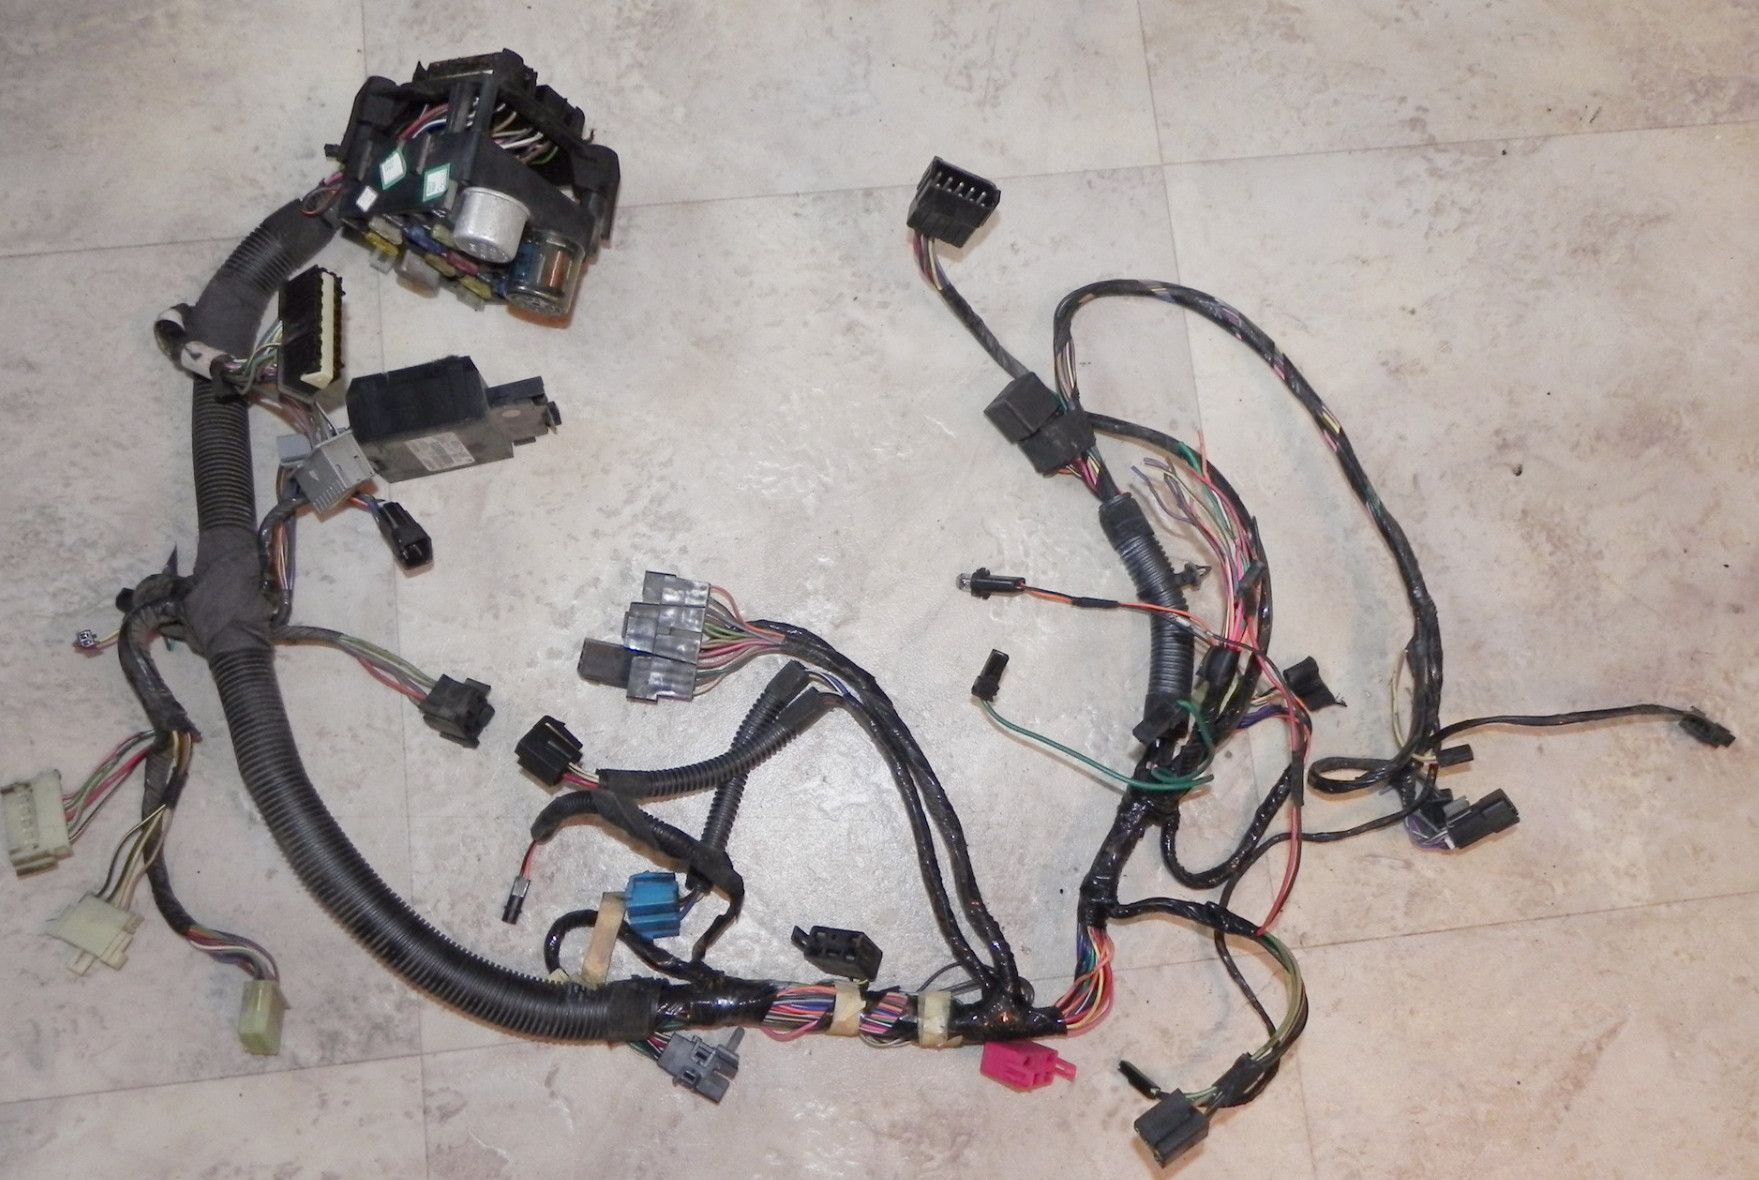 medium resolution of jeep wrangler yj interior under dash wiring harness 92 95